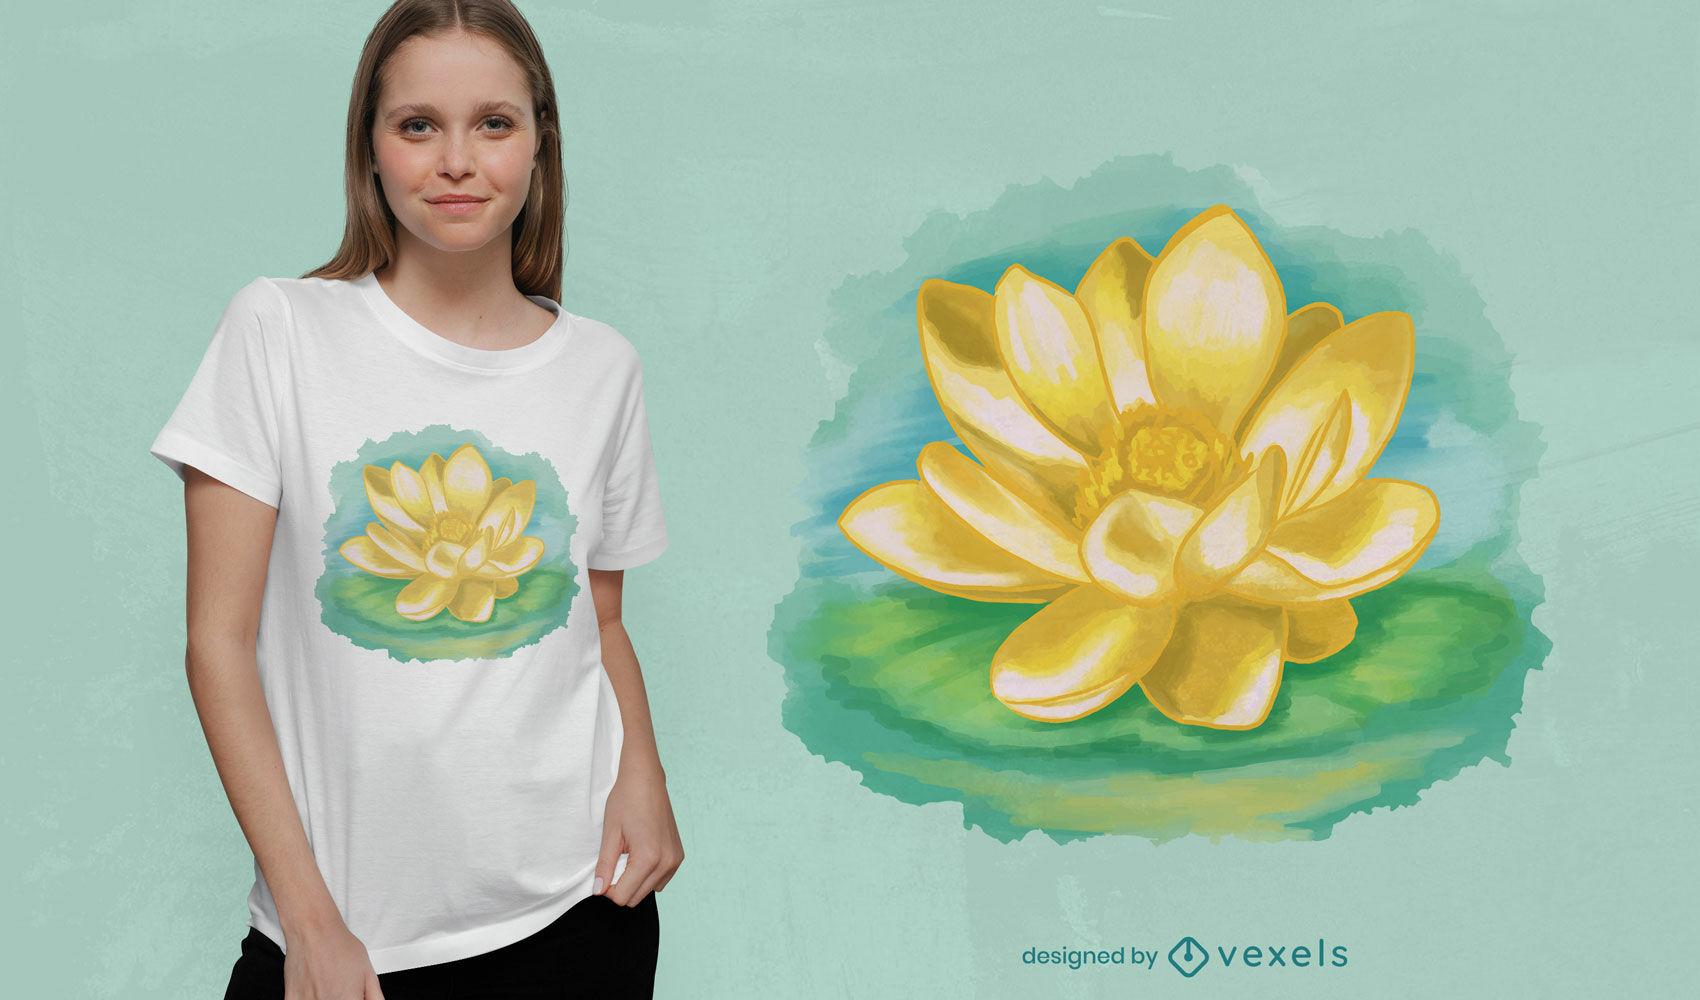 Diseño de camiseta de flor de loto de acuarela